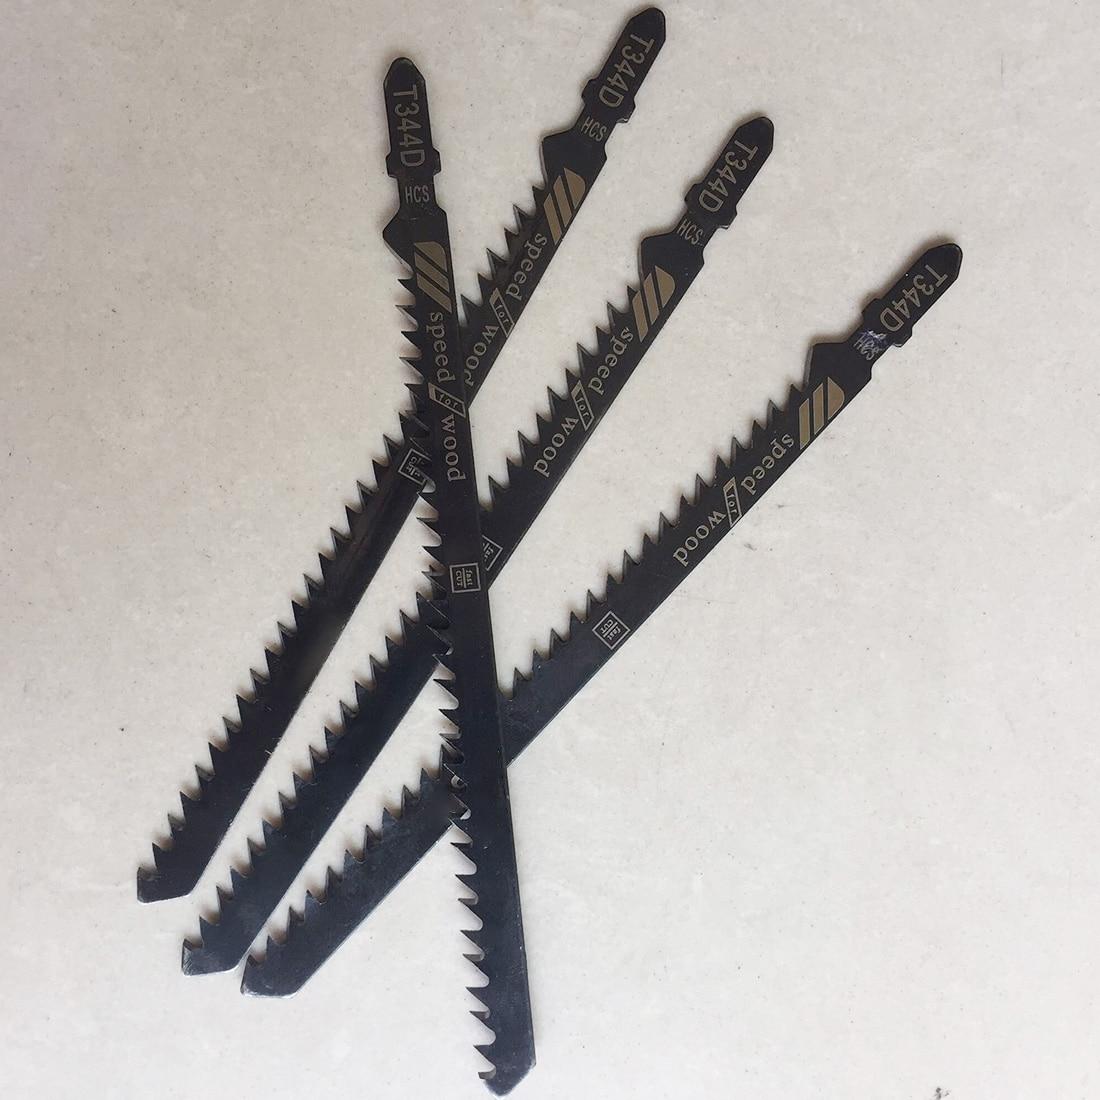 10PCS 152mm T344D Super long Saw Blades Clean Cutting For Wood PVC ...